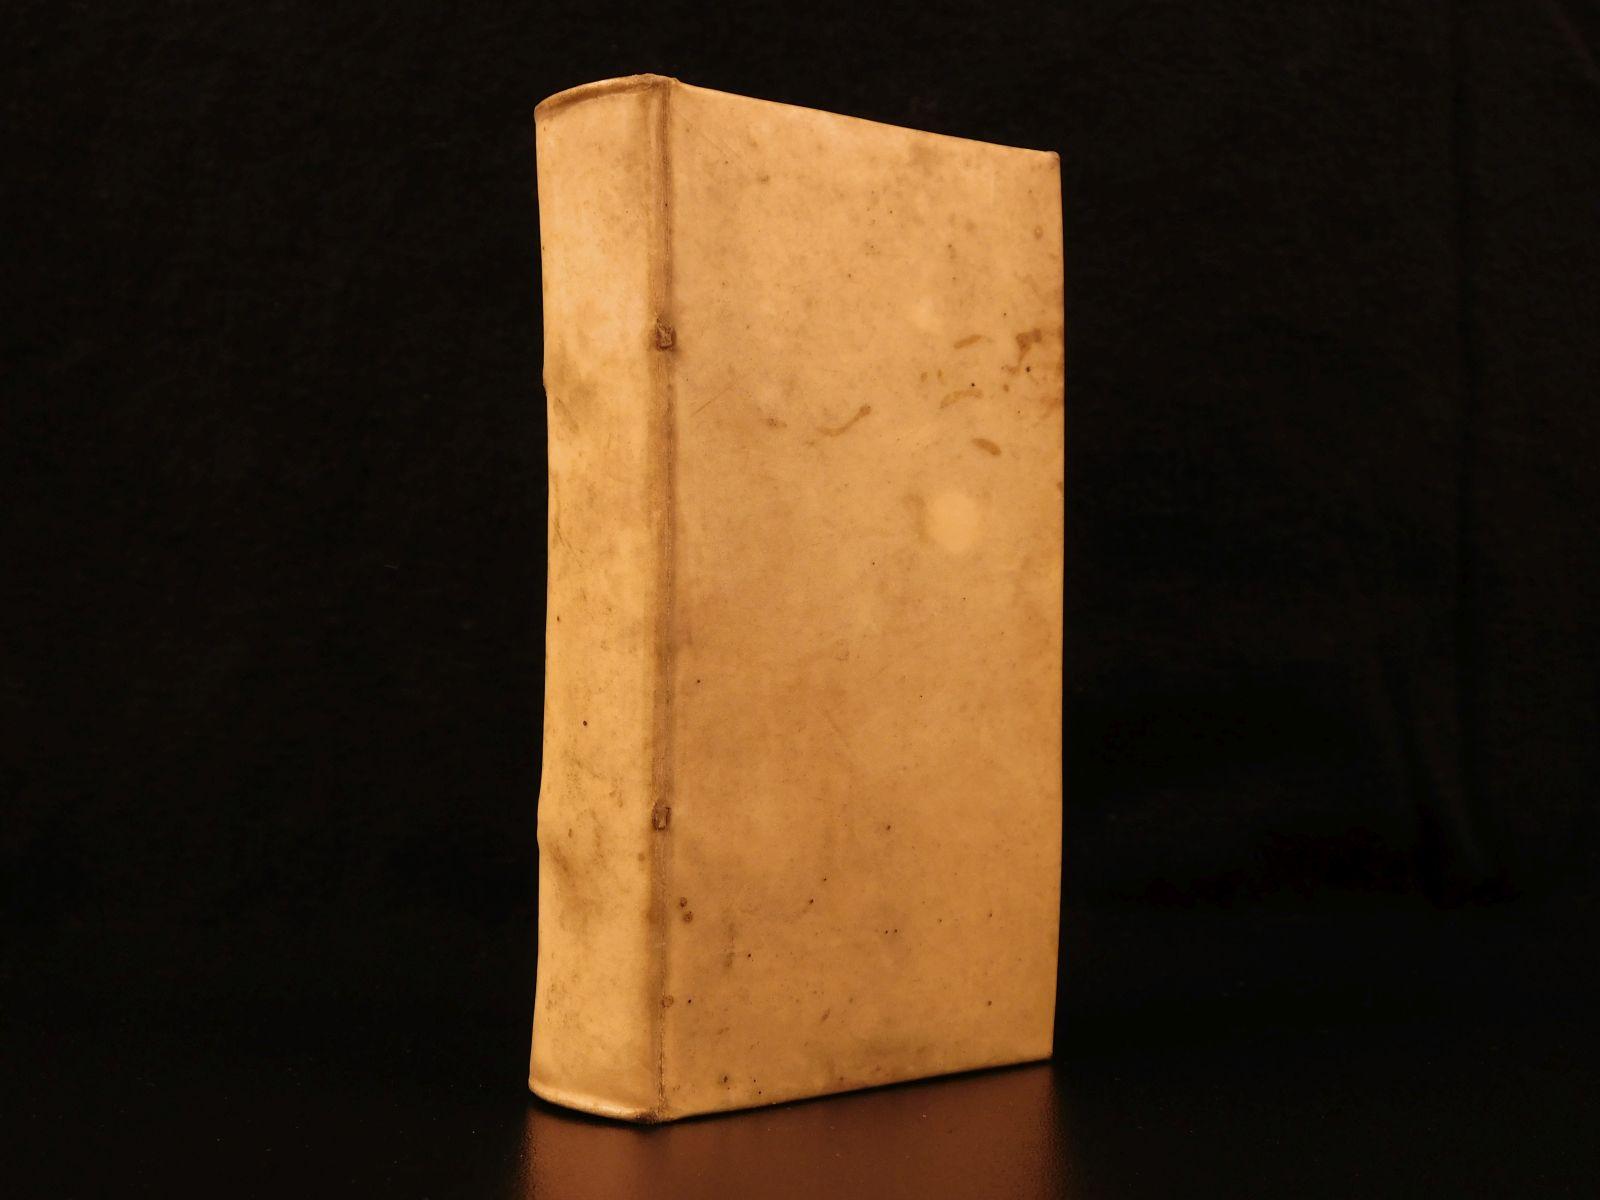 Abridgement of Roman History/Book V